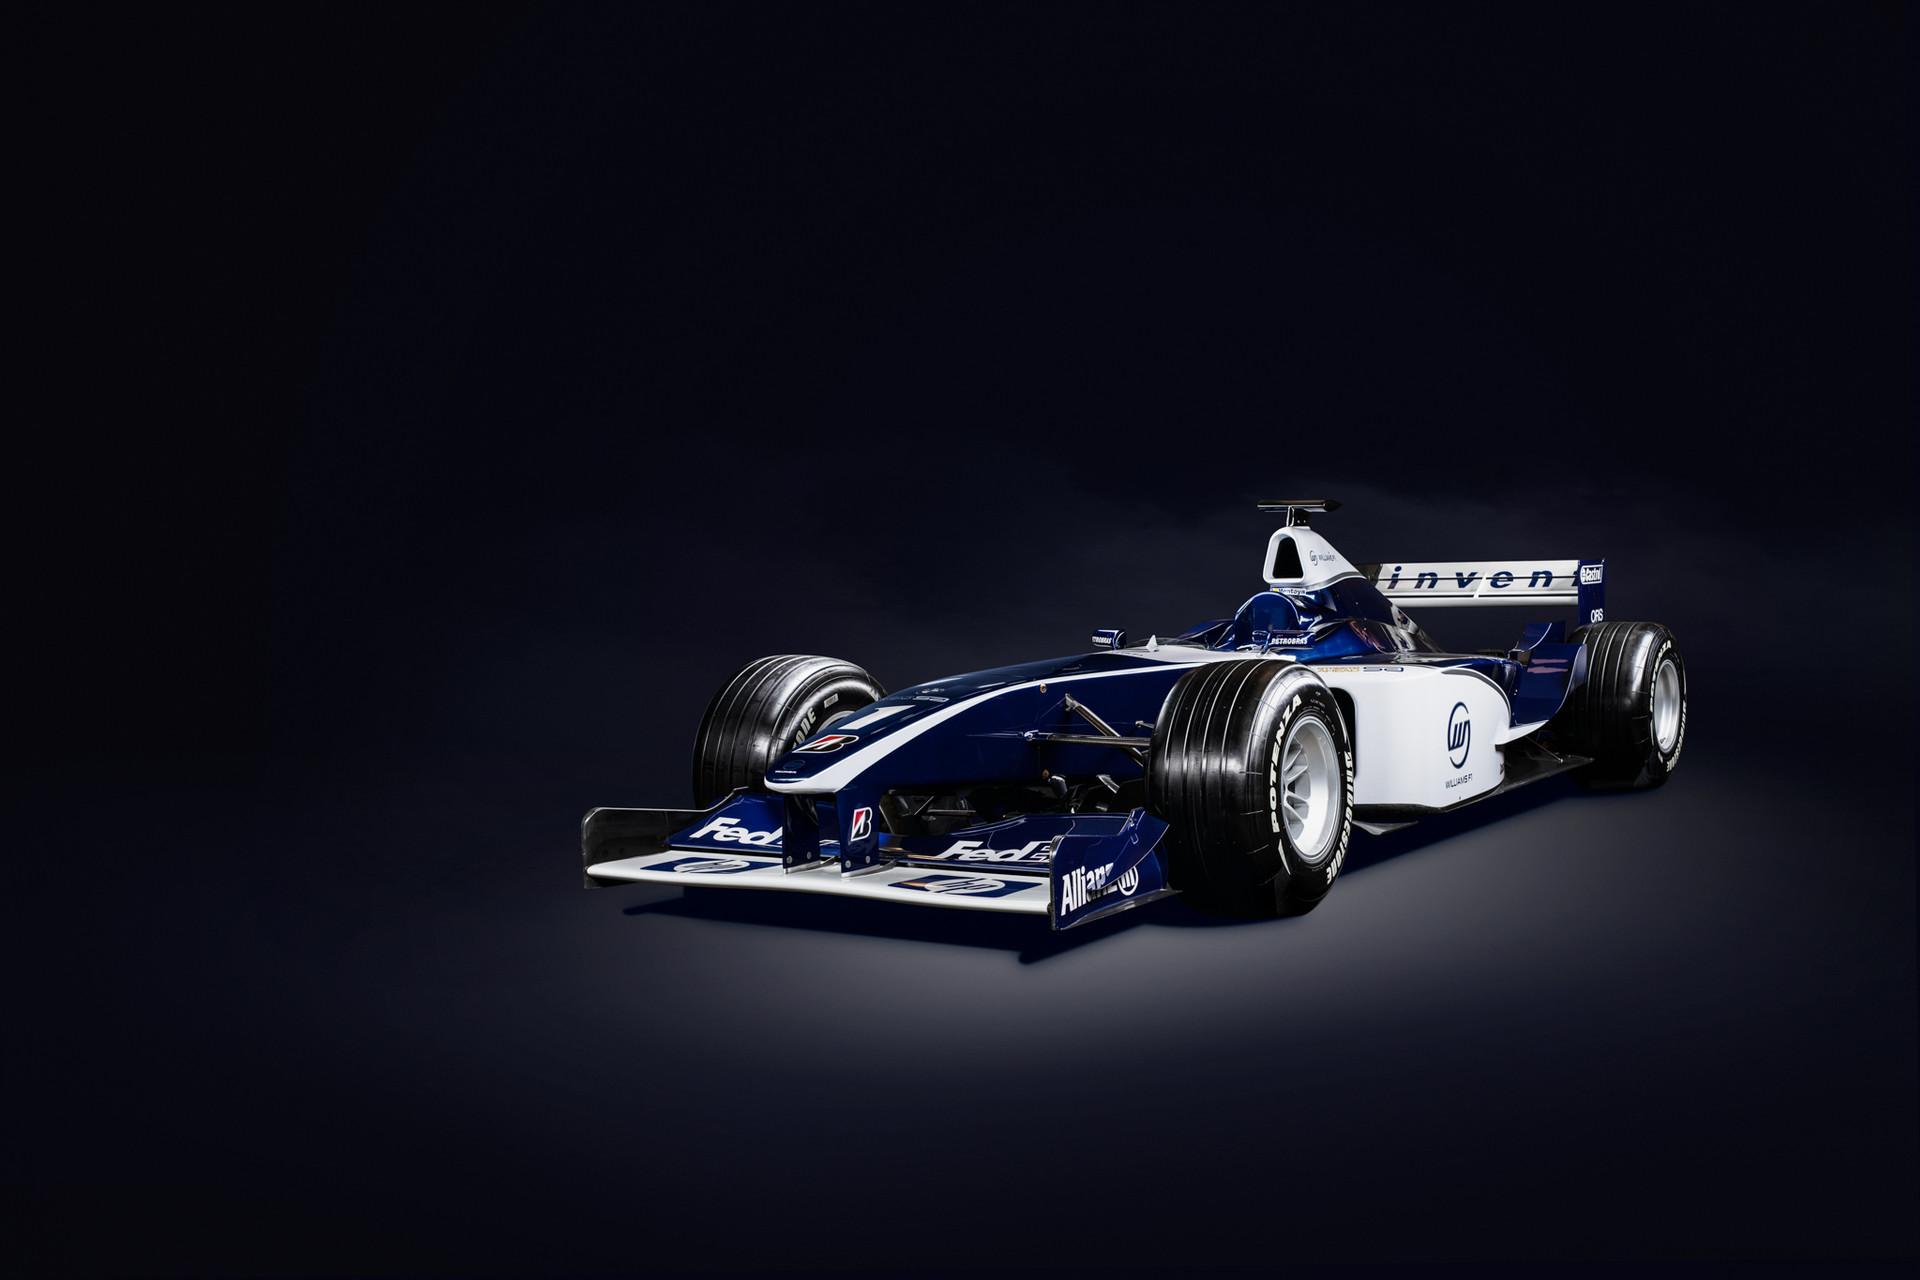 FW23 F1 (1 of 5).jpg